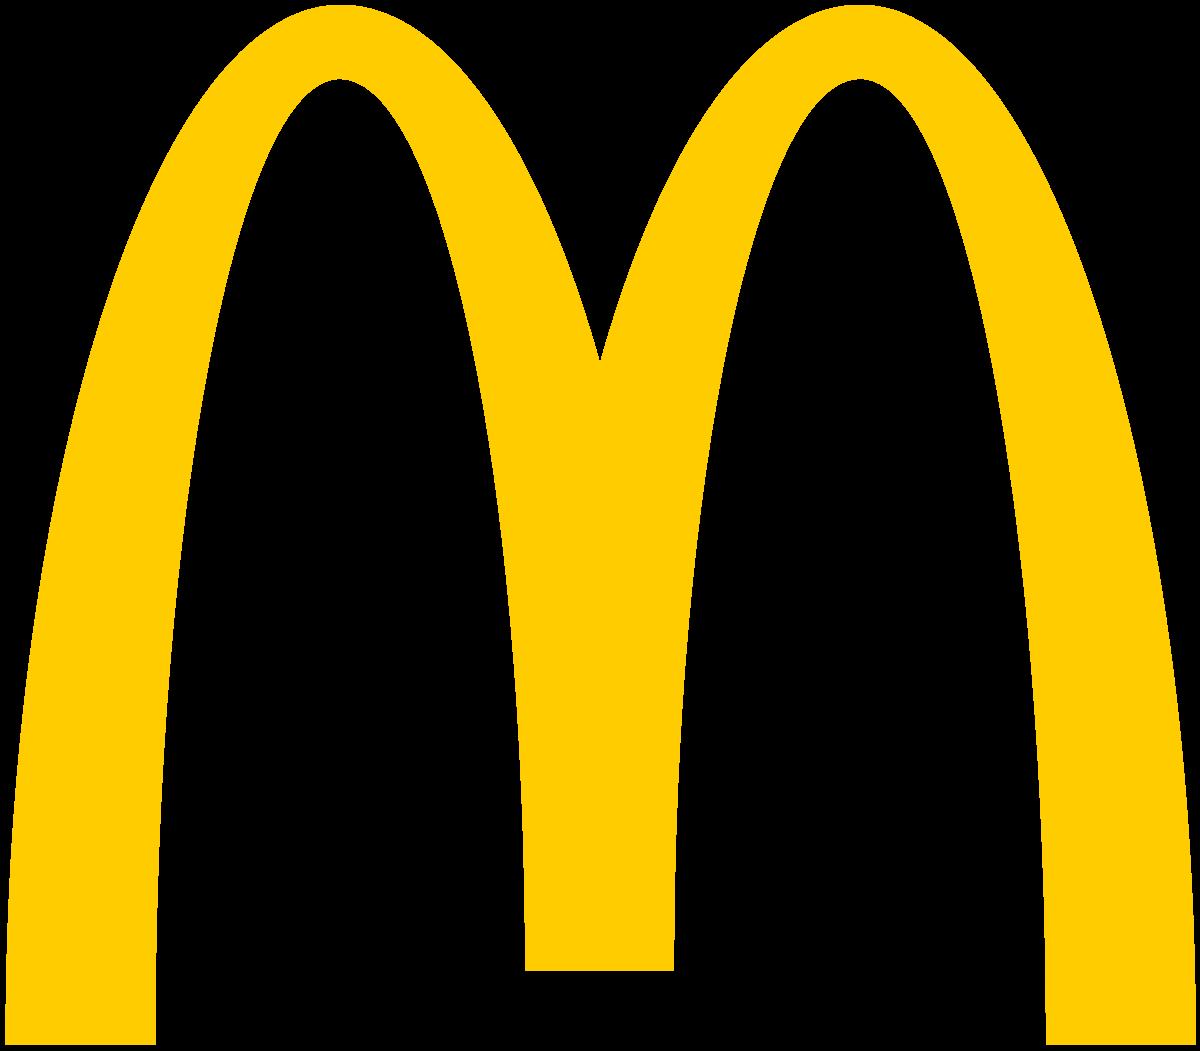 Macdonalds monogram logo